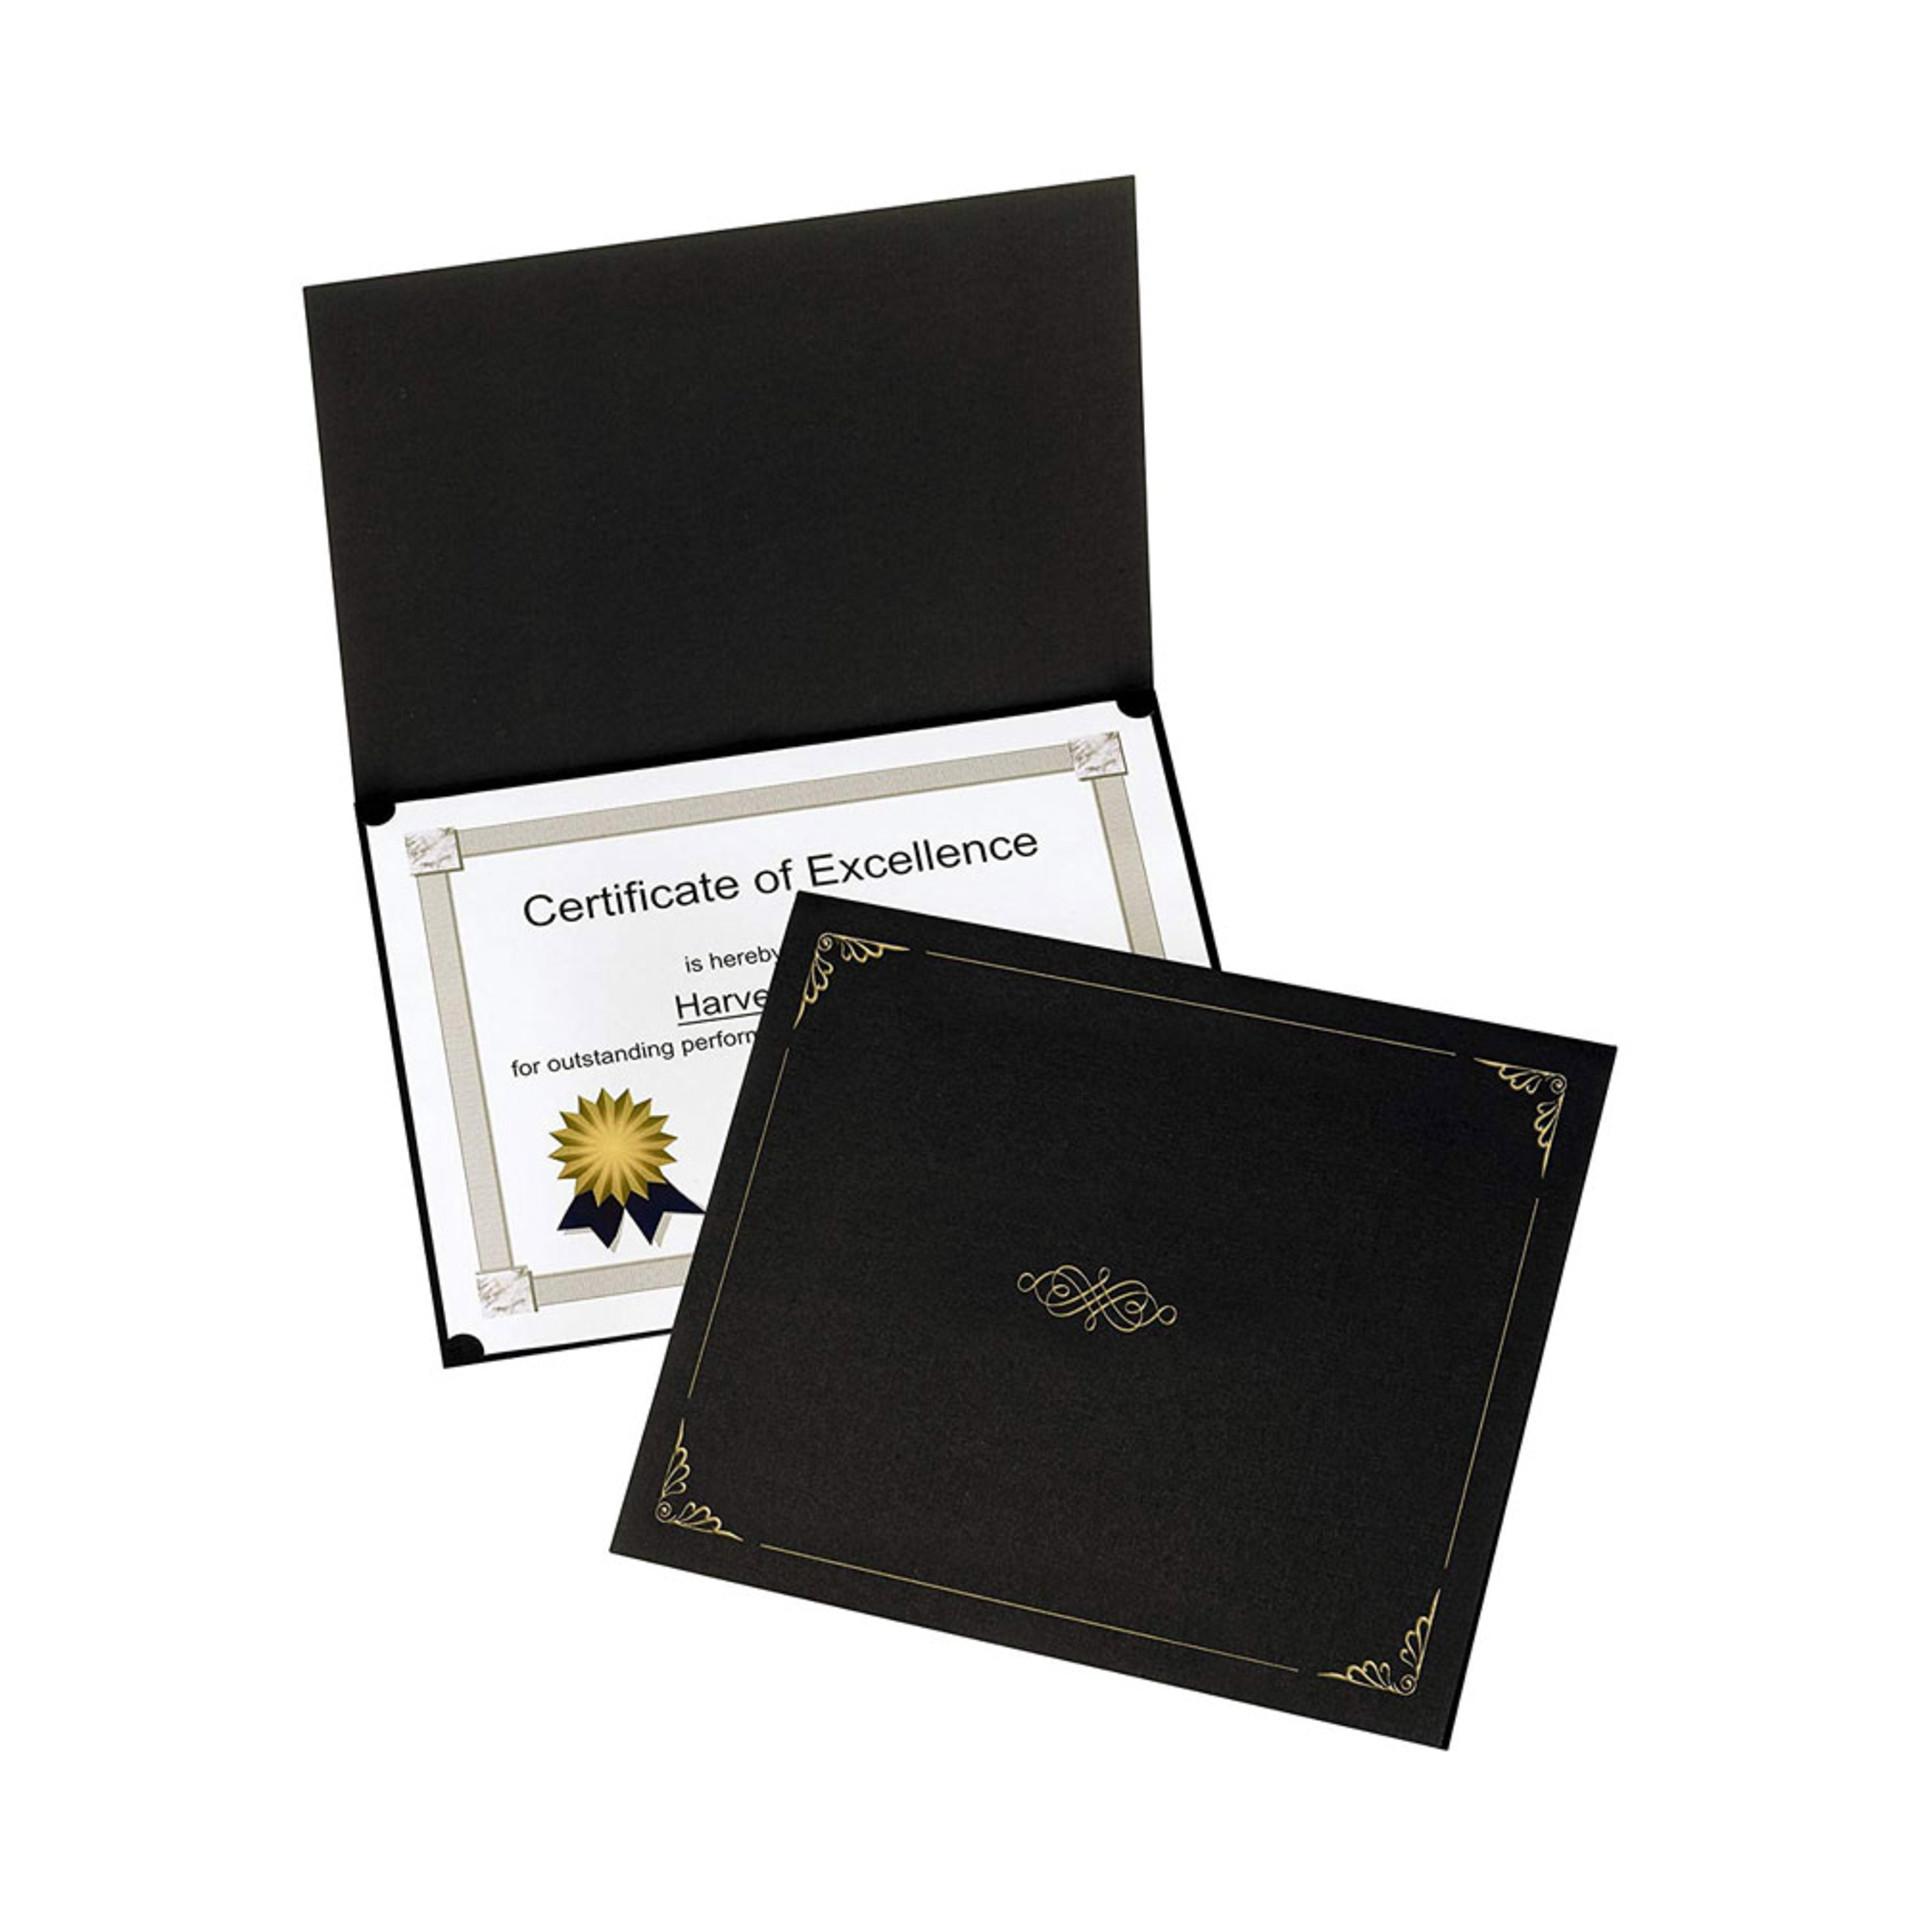 "Oxford Black 12.5""x9.75"" Diploma Certificate Holder 5 Pack"